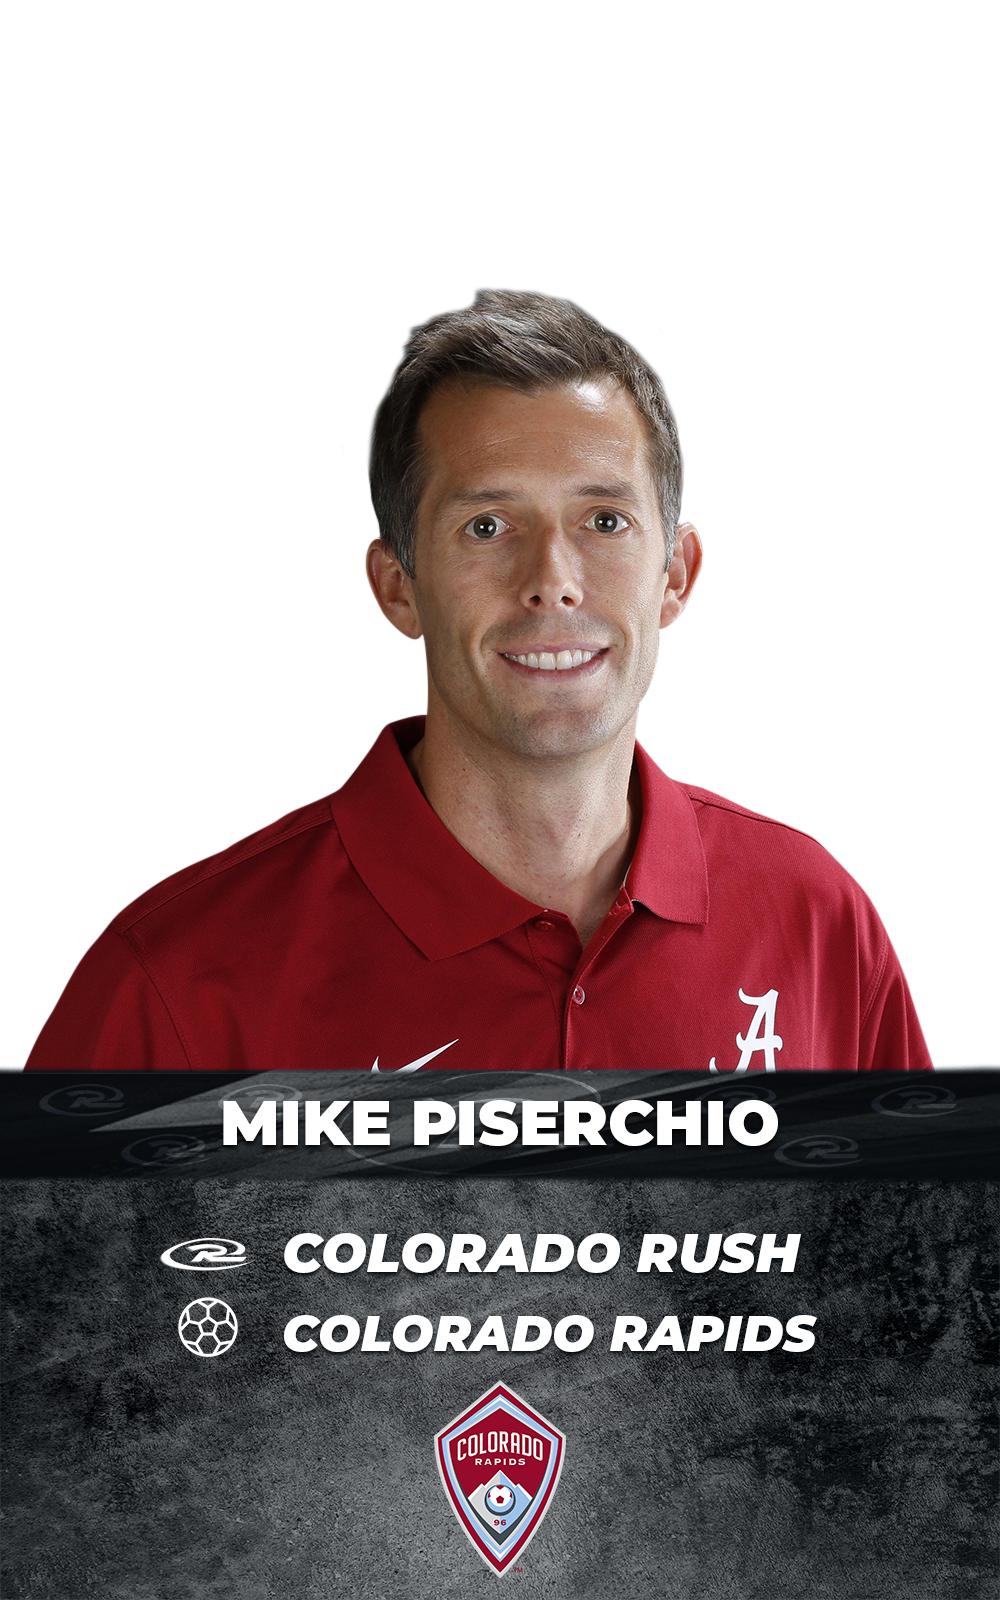 Mike-Piserchio